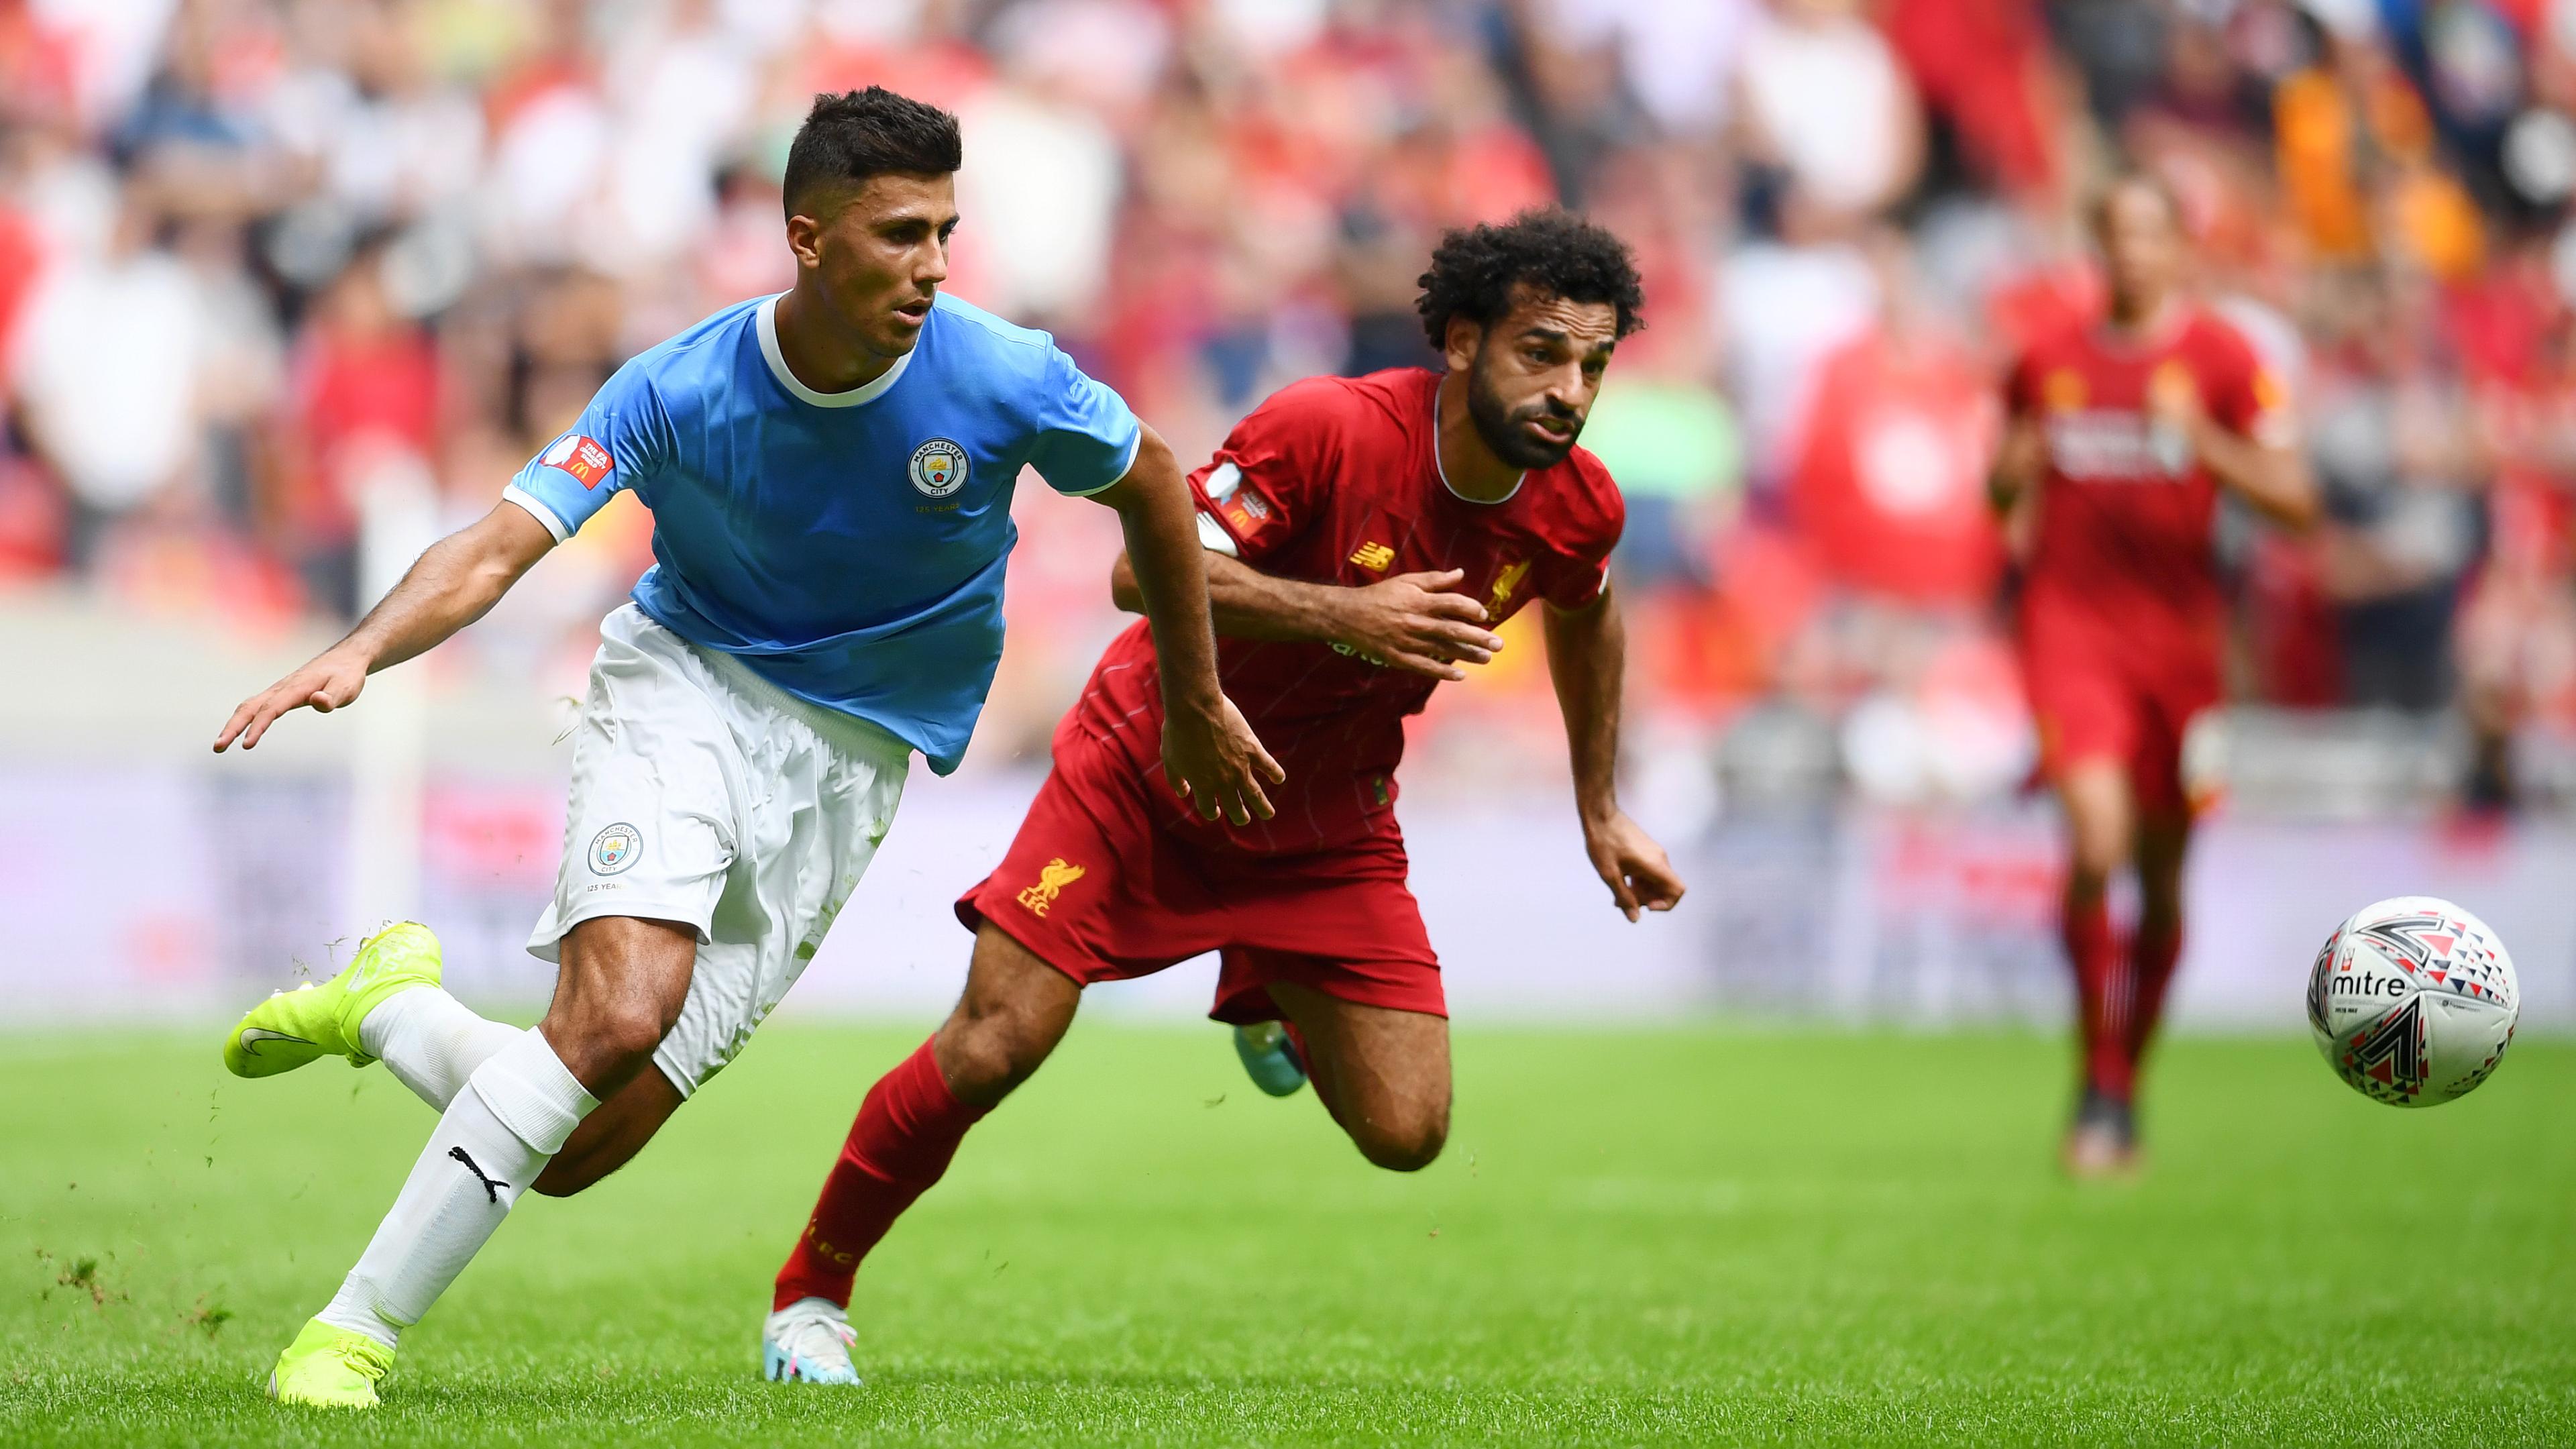 Wer Zeigt Ubertragt Fc Liverpool Vs Manchester City Heute